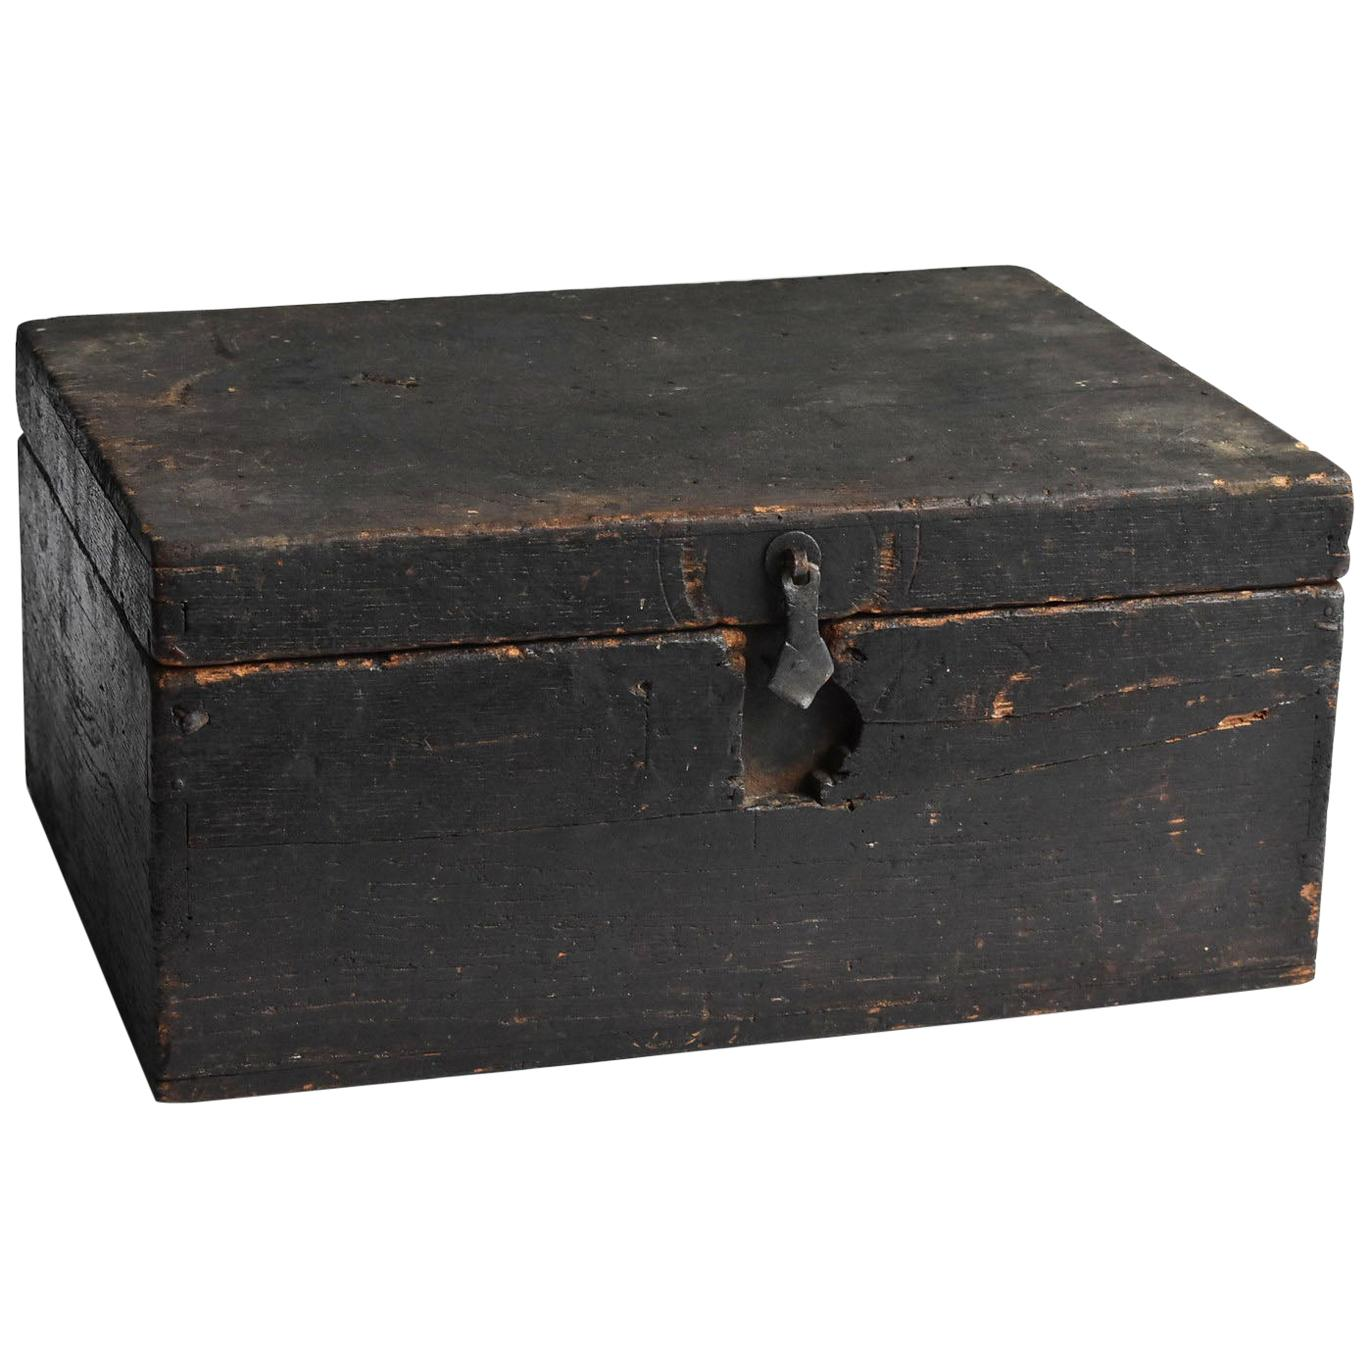 Japanese Old Wooden Tool Box / Antique Display Stand / Wabi-Sabi Storage Box